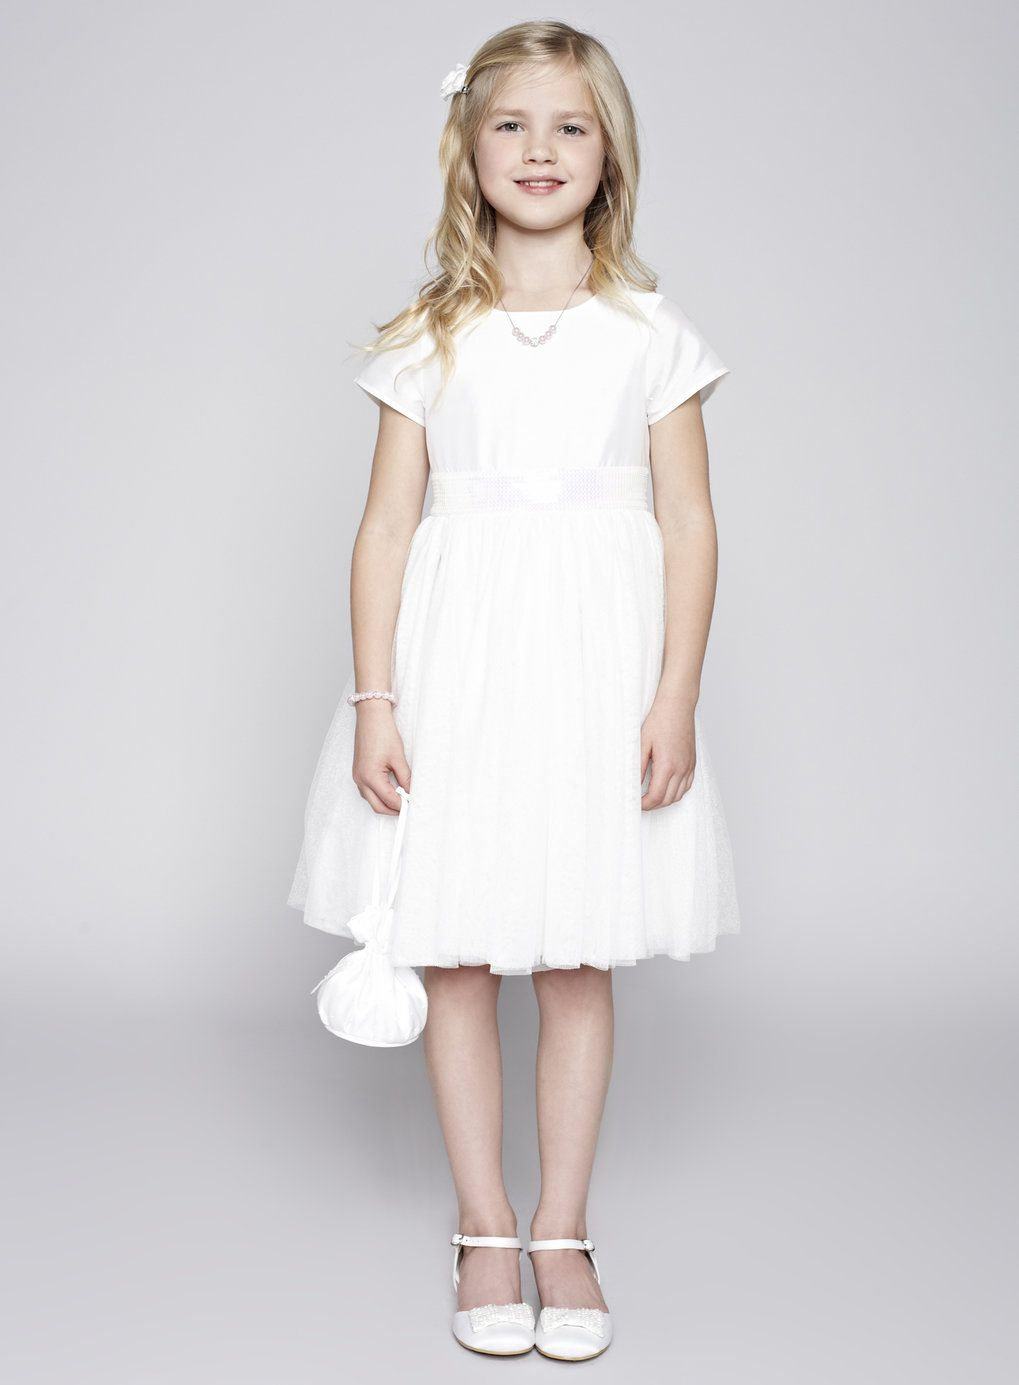 Bhs Flower Girl Dress Midway Media